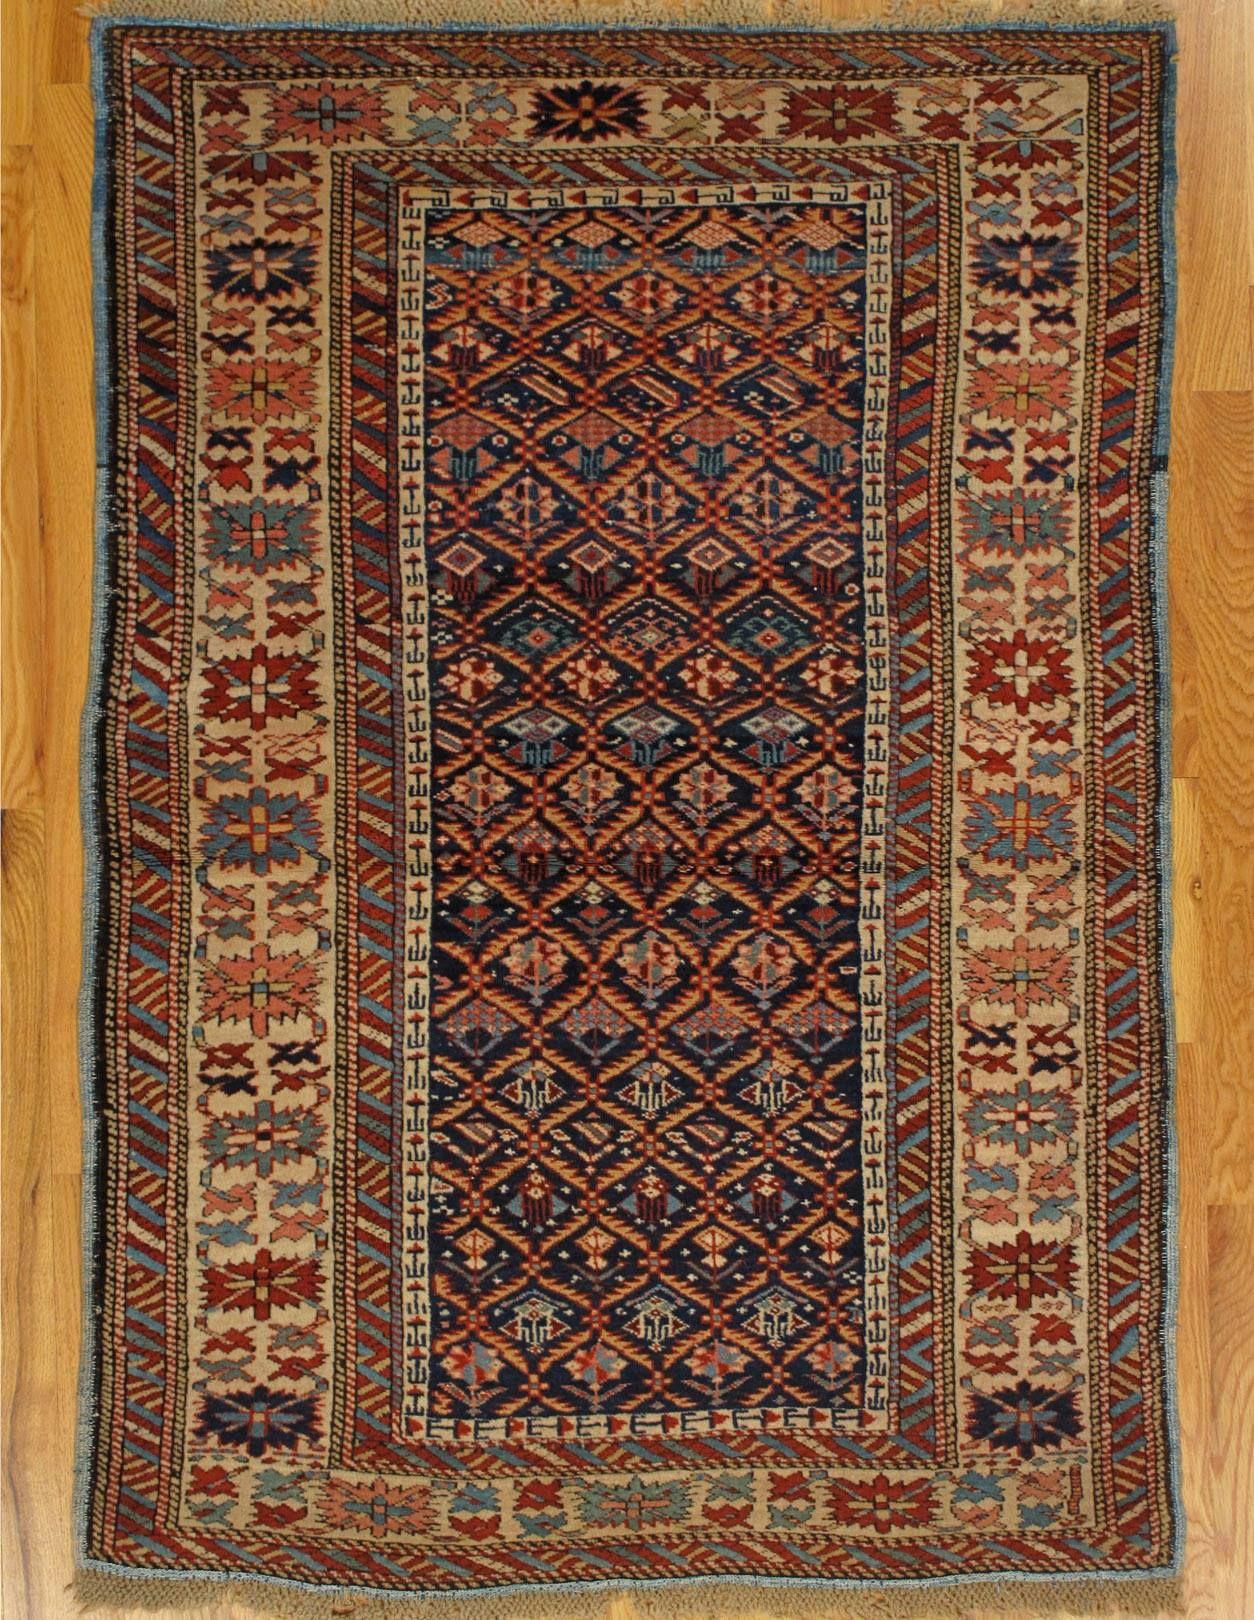 Hagop Manoyan Antique Rugs Kuba Rug Eastern Caucasus West Coast Of The Caspian Sea Circa 1880 Size 4 10 X3 4 147x102 Carpet Sale Vintage Style Rugs Rugs